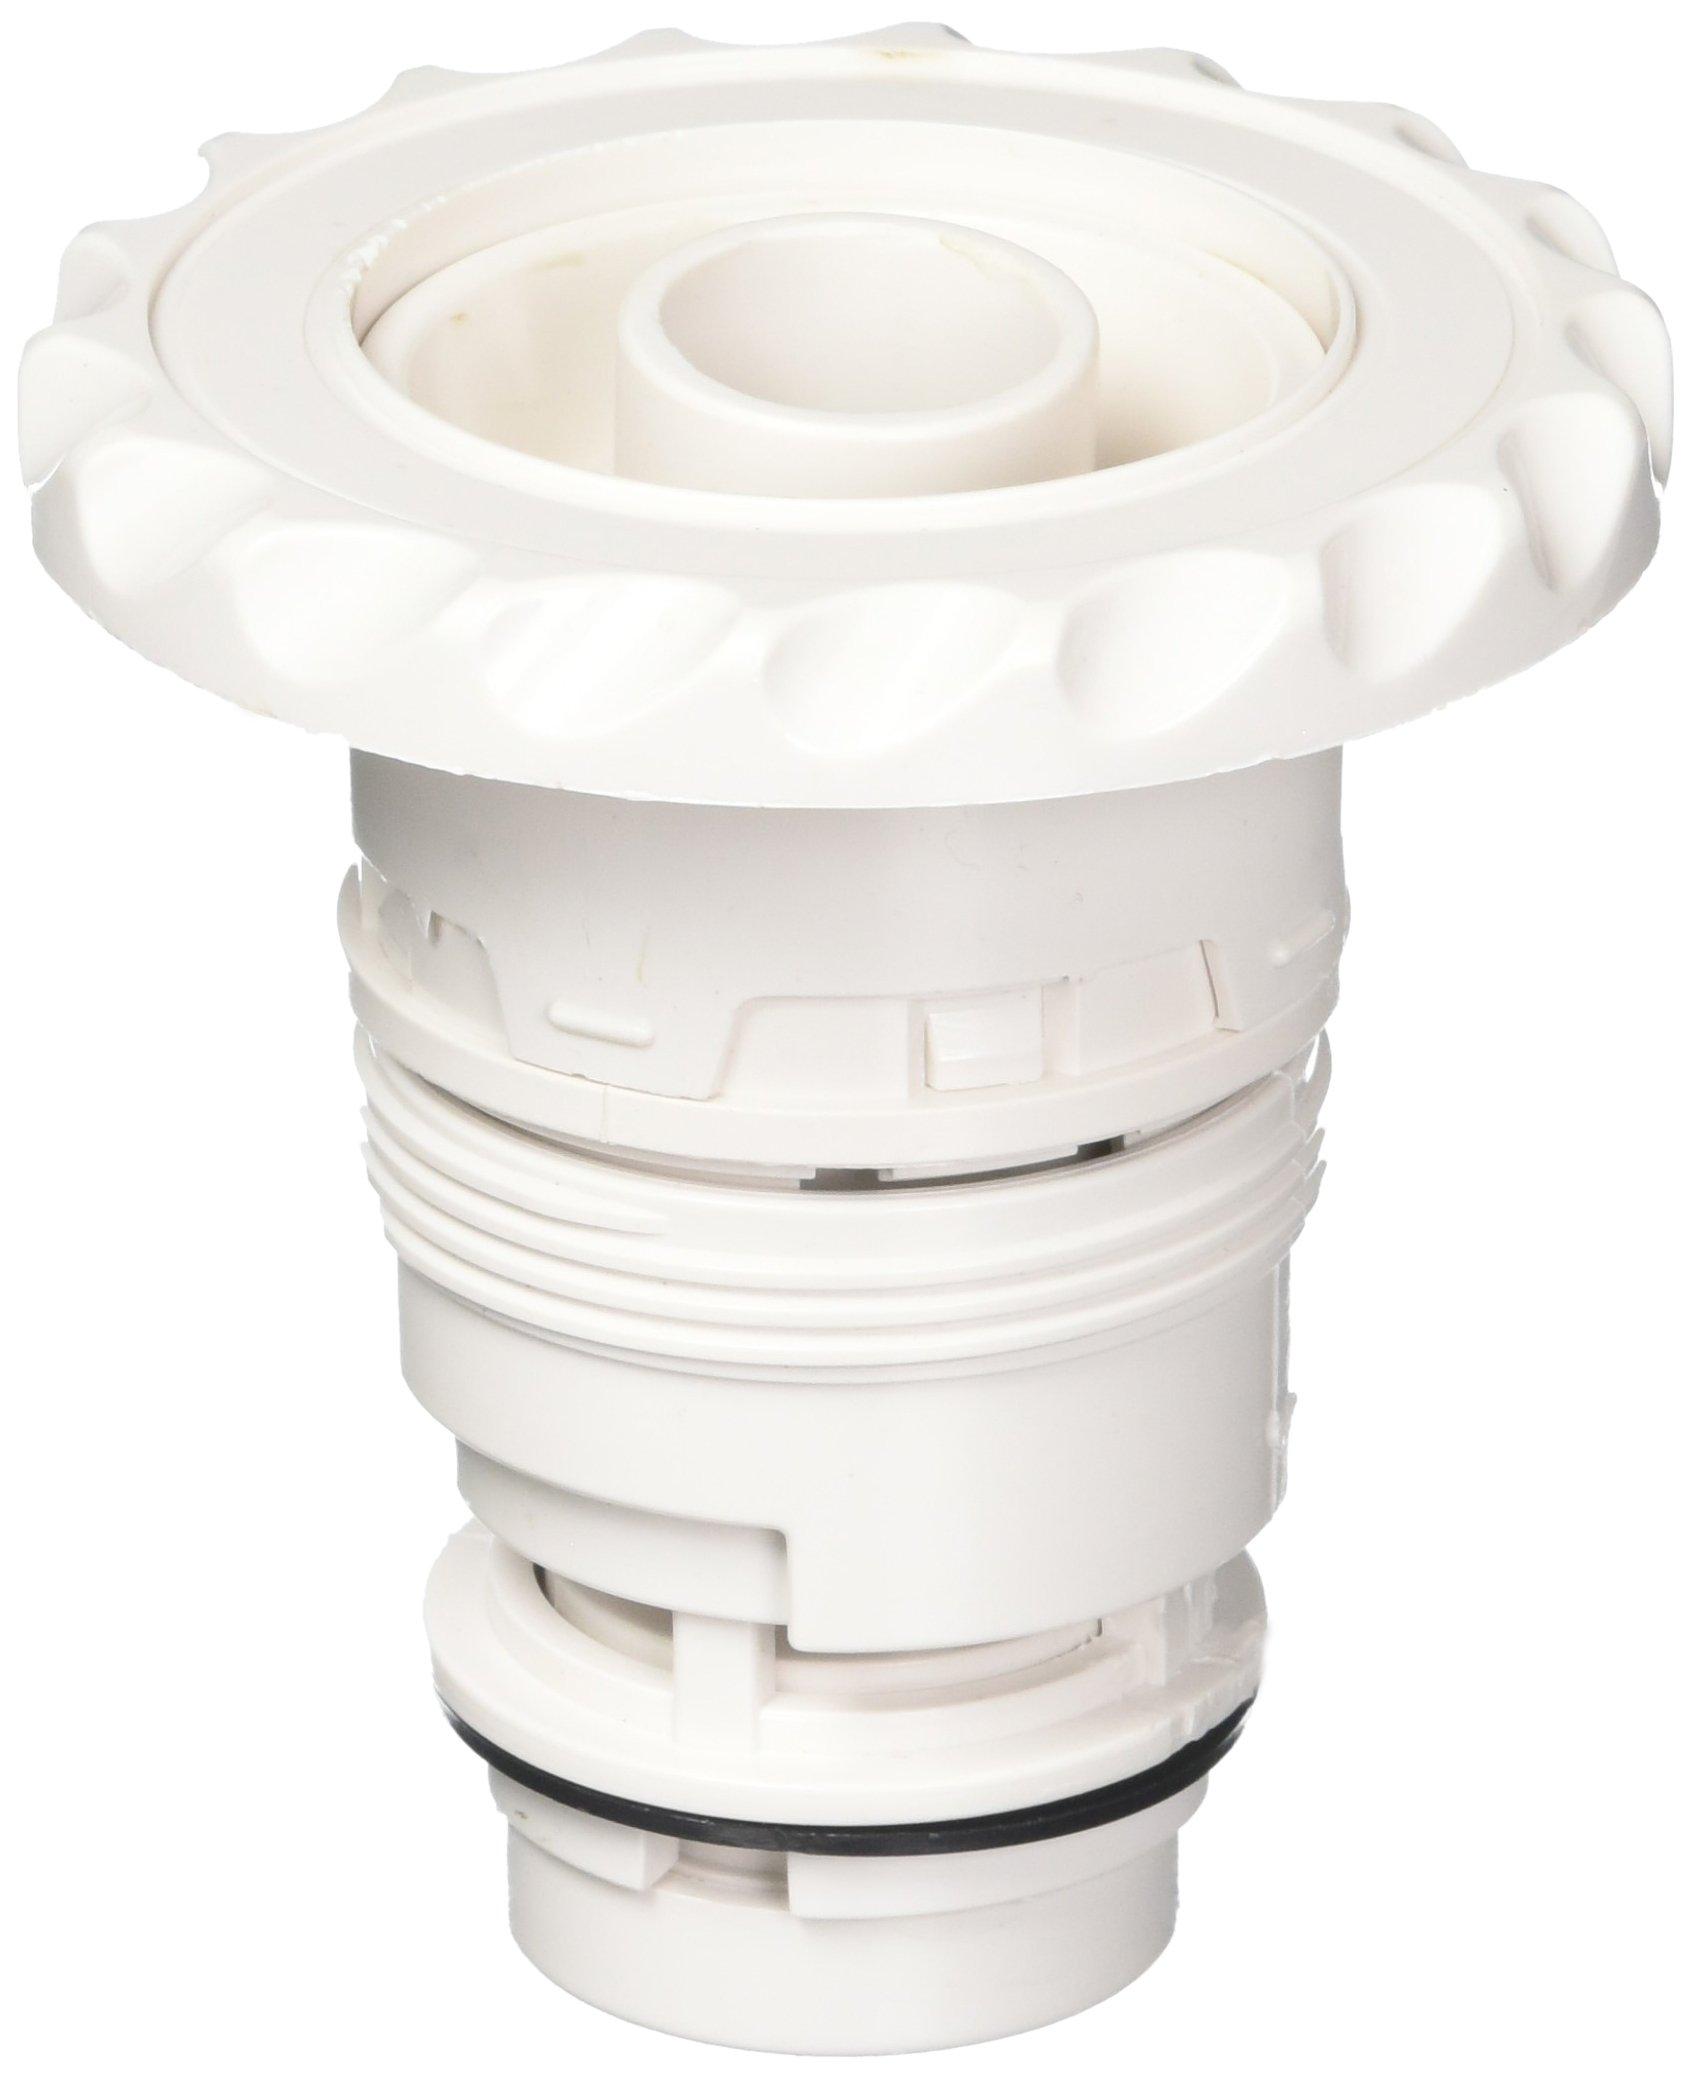 Waterway Plastics 806105021465 Internal White Adjustable Deluxe Poly Jet